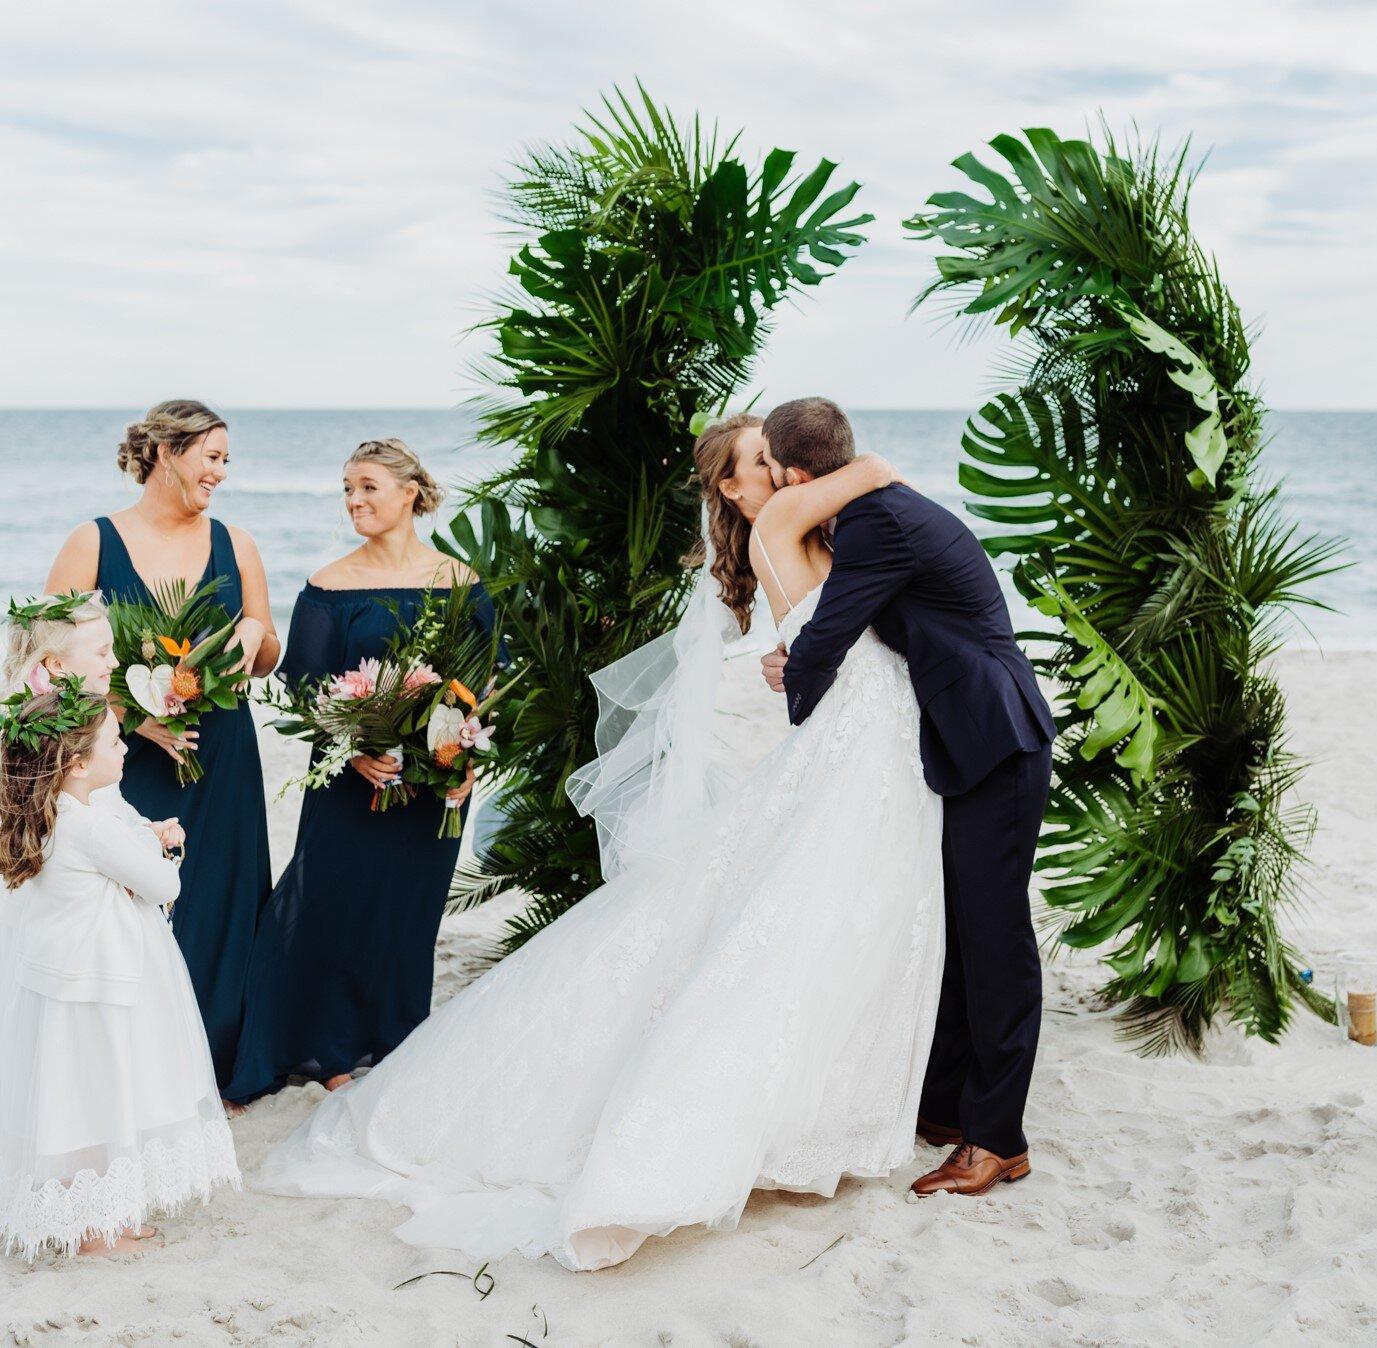 Beach+Wedding+Crim+Barefoot+Beach+Bride+(2)